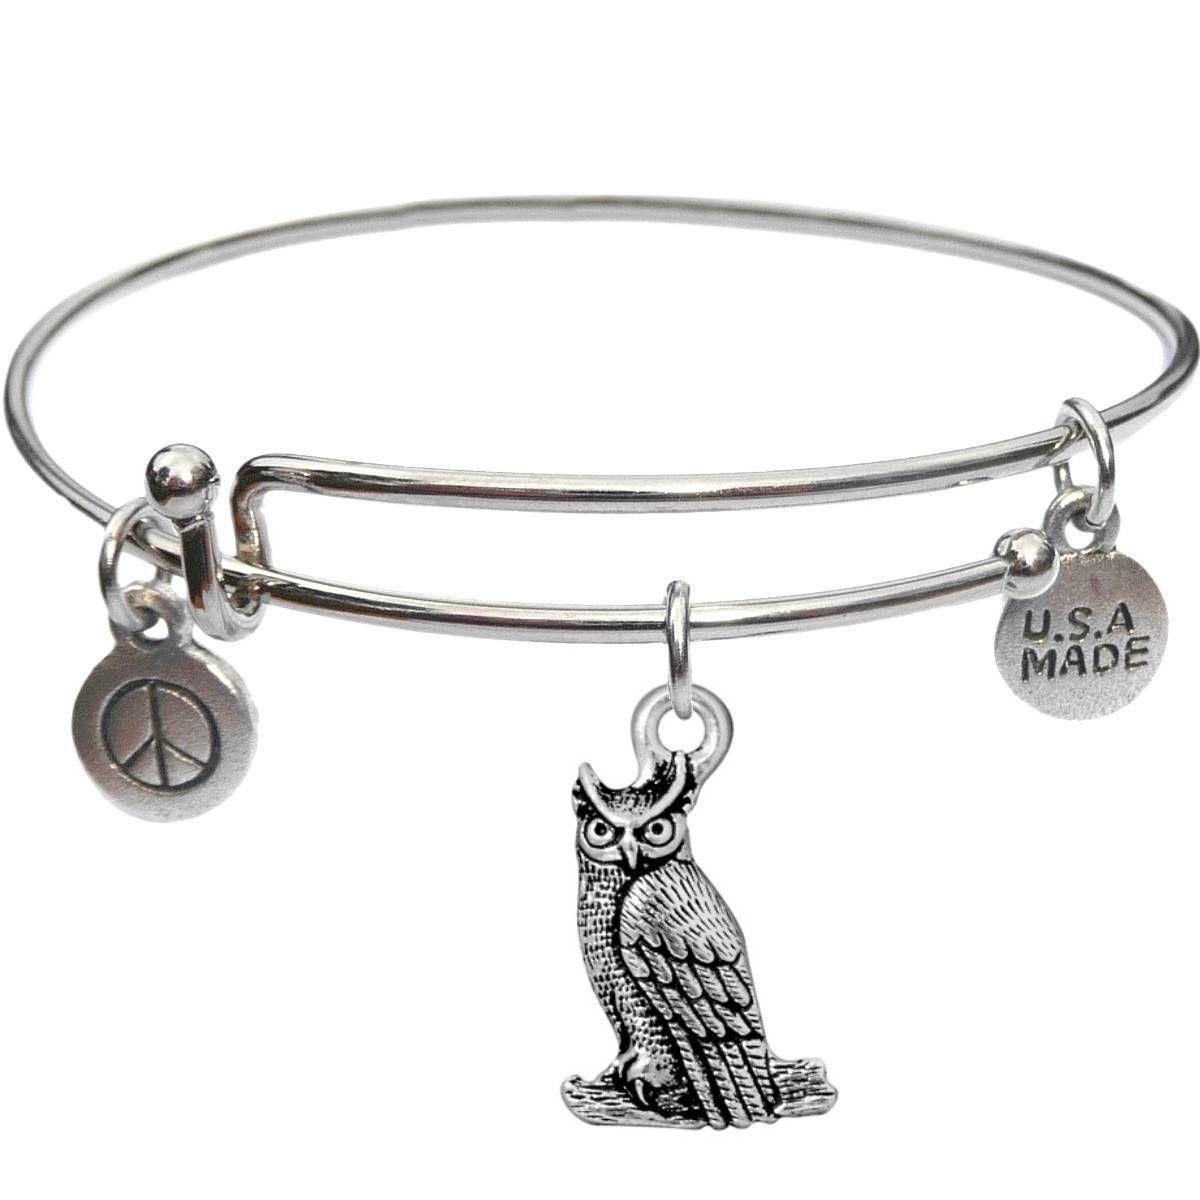 Bangle Bracelet and Owl - USA Made - BBandJT183